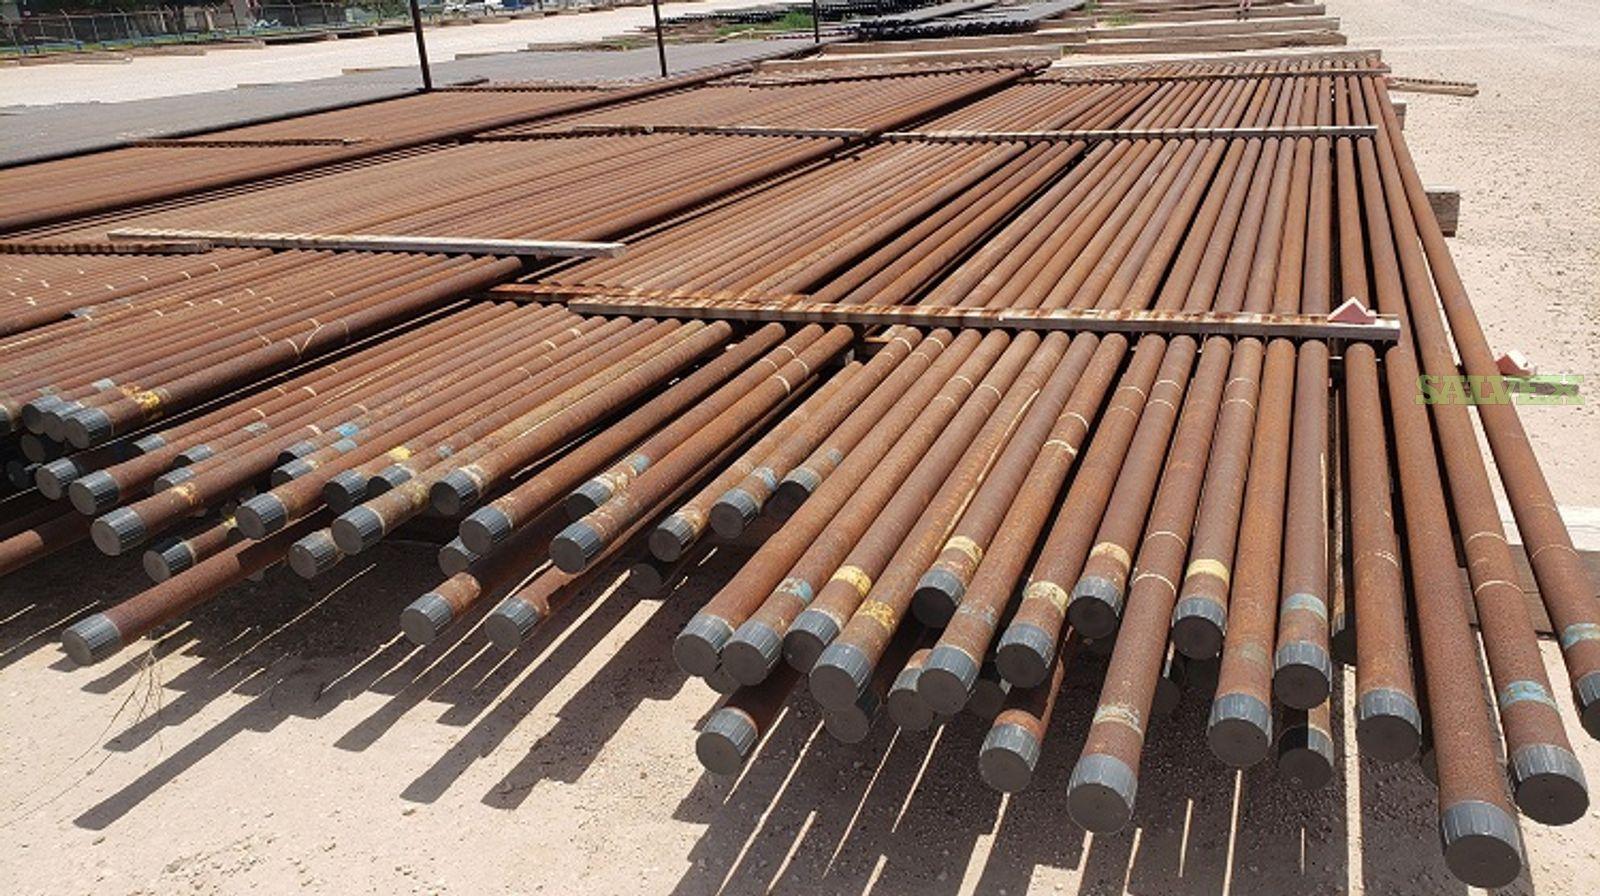 2 7/8 6.50# L80 EUE  Fiberglass Lined R2 Structural Tubing (11,160 Feet / 33 Metric Tons)